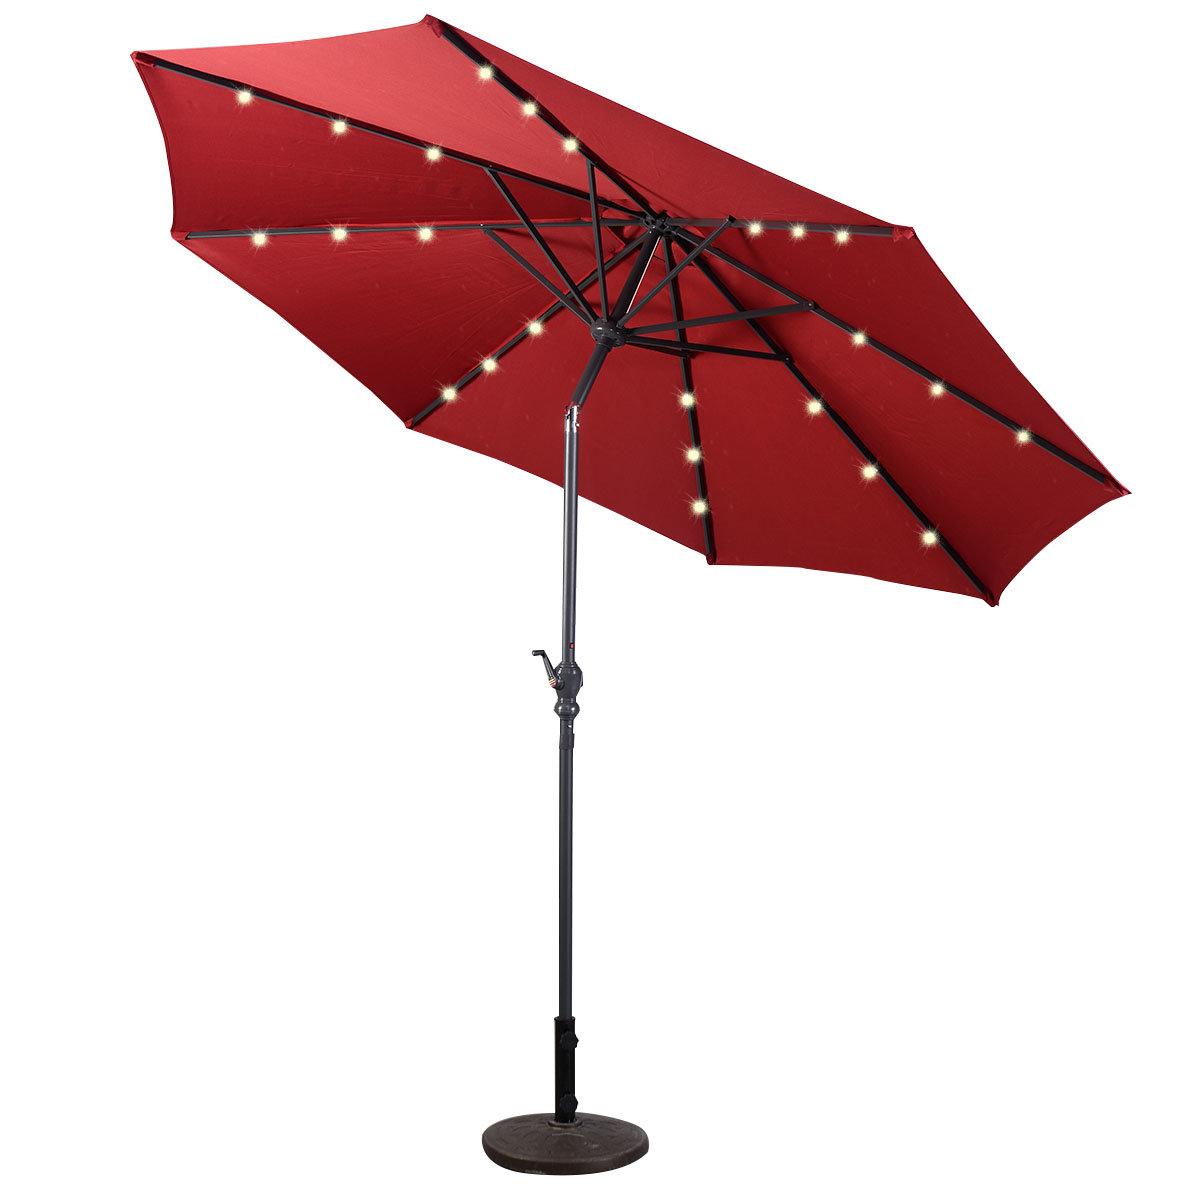 Widely Used Herlinda Solar Lighted Market Umbrellas Within Baggett Patio Solar 10' Market Umbrella (View 20 of 20)